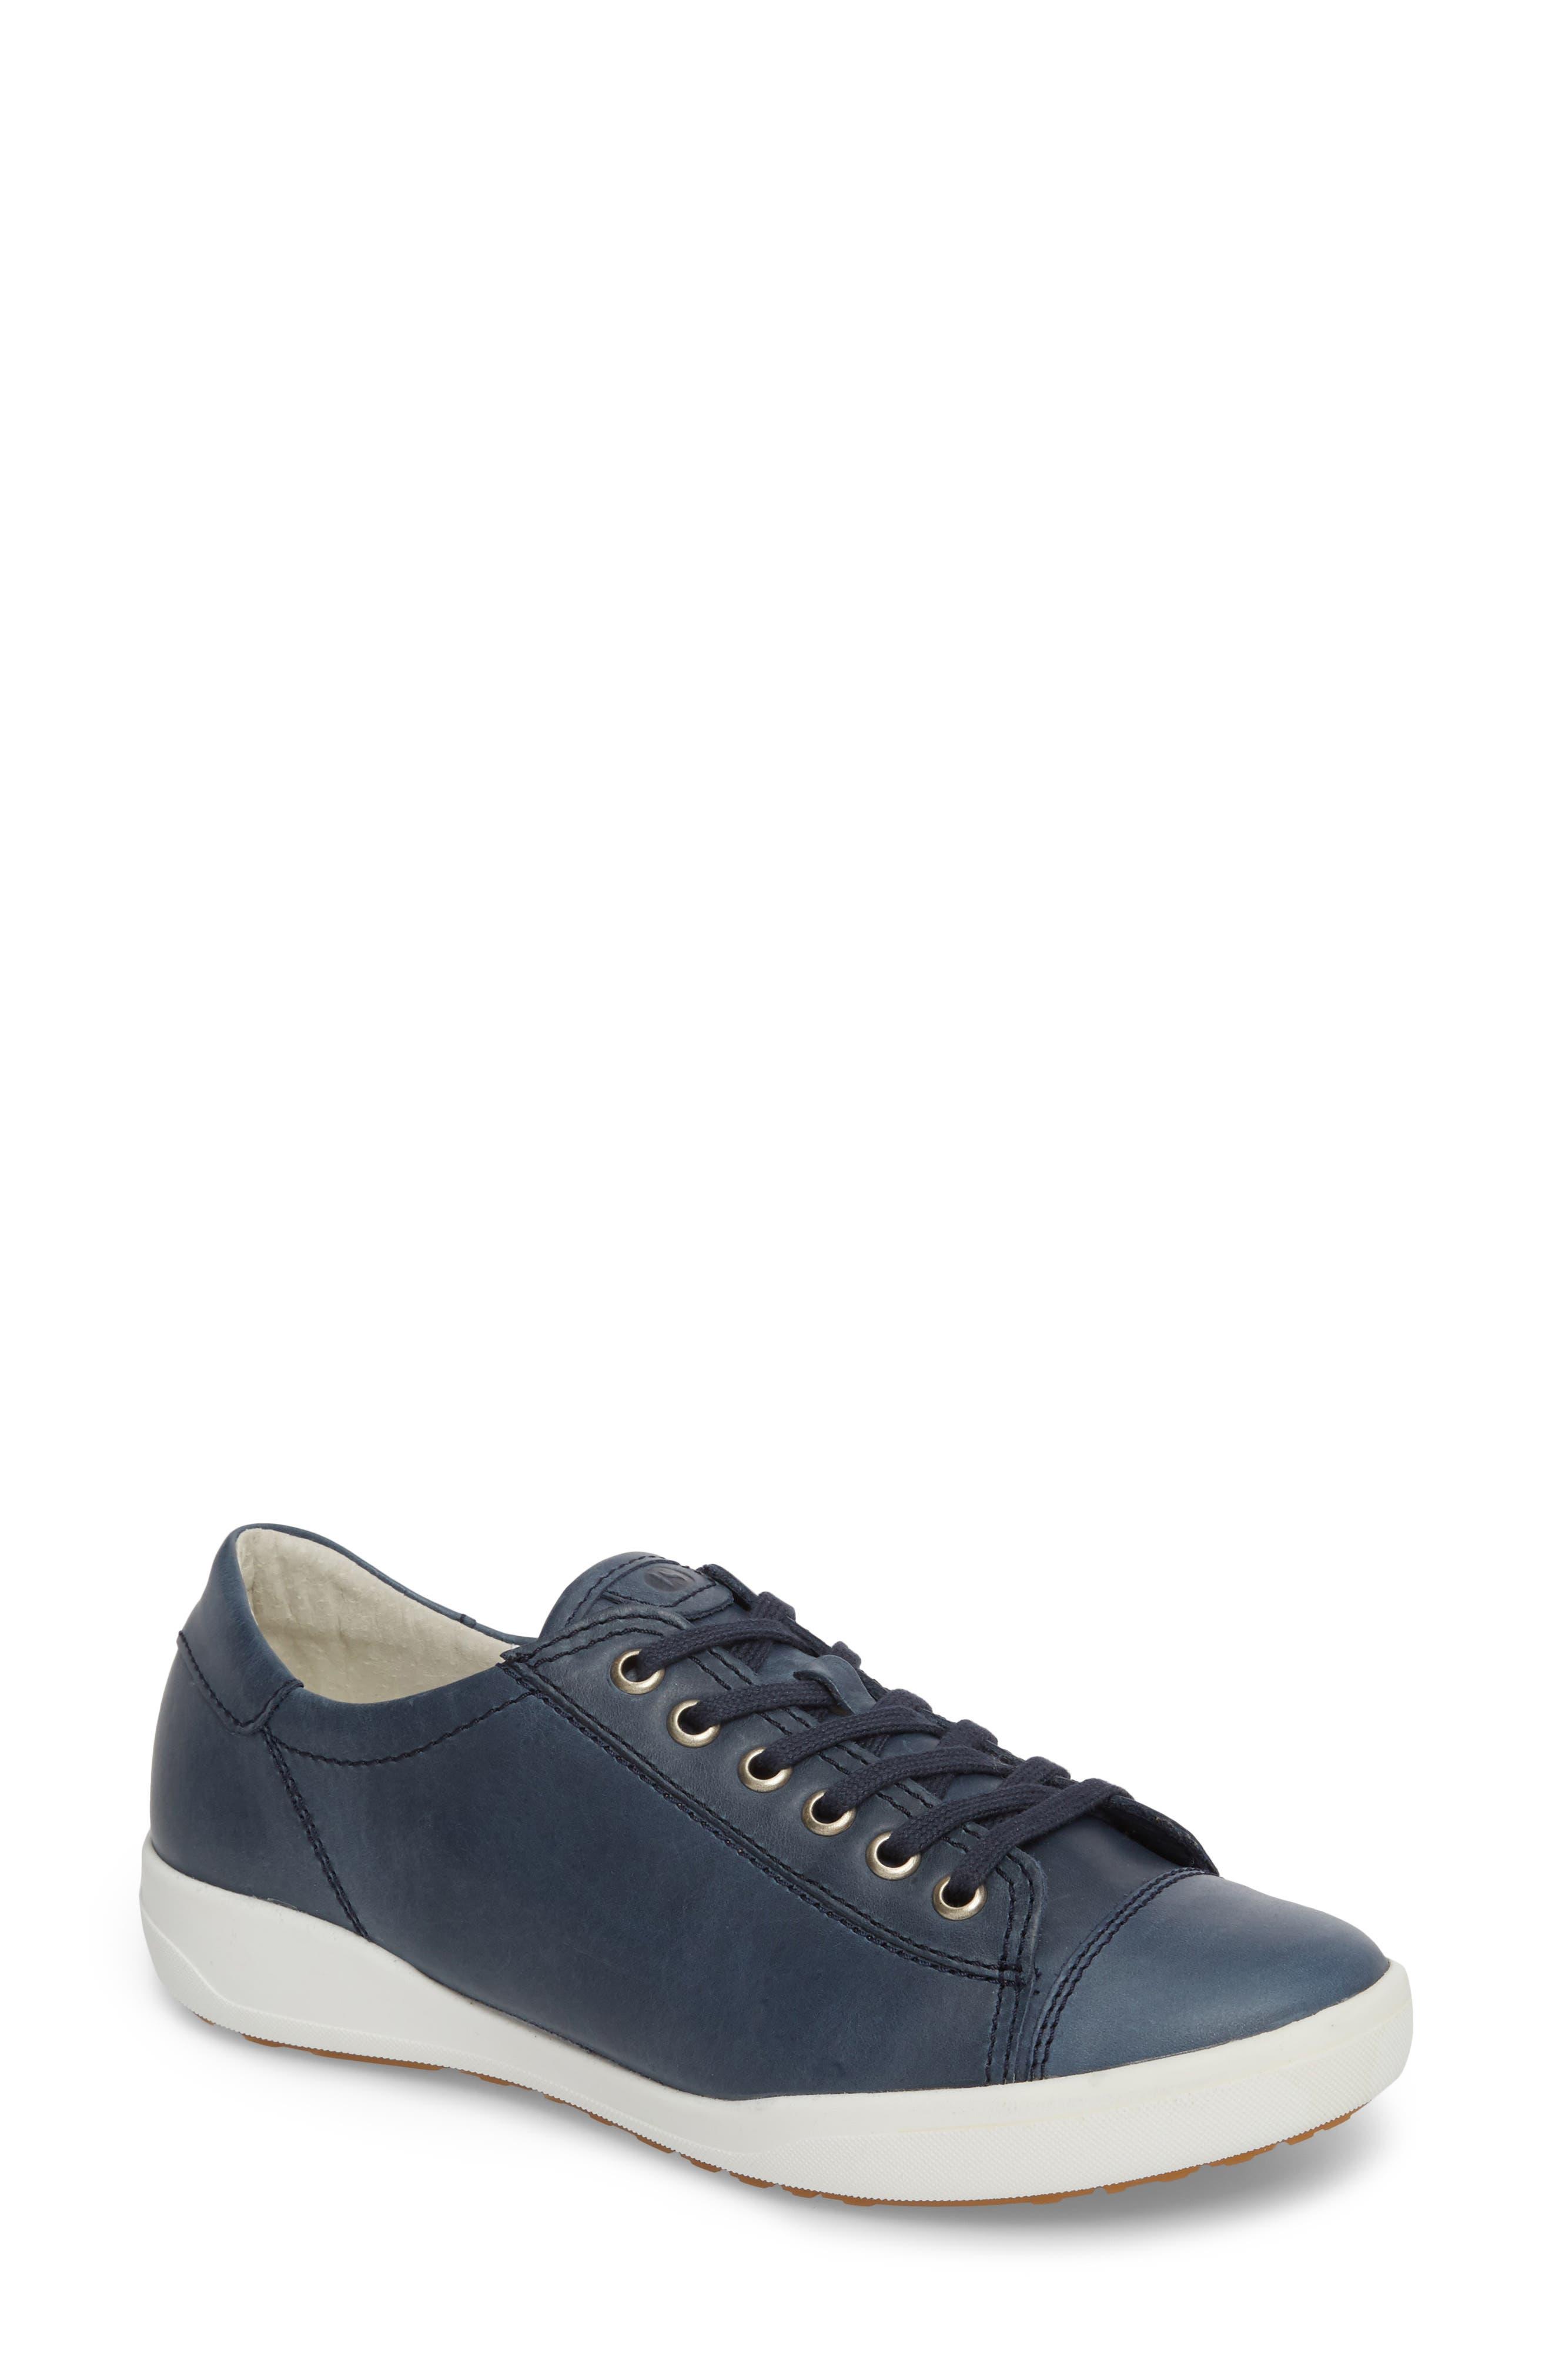 Sina 11 Sneaker,                         Main,                         color, DENIM LEATHER